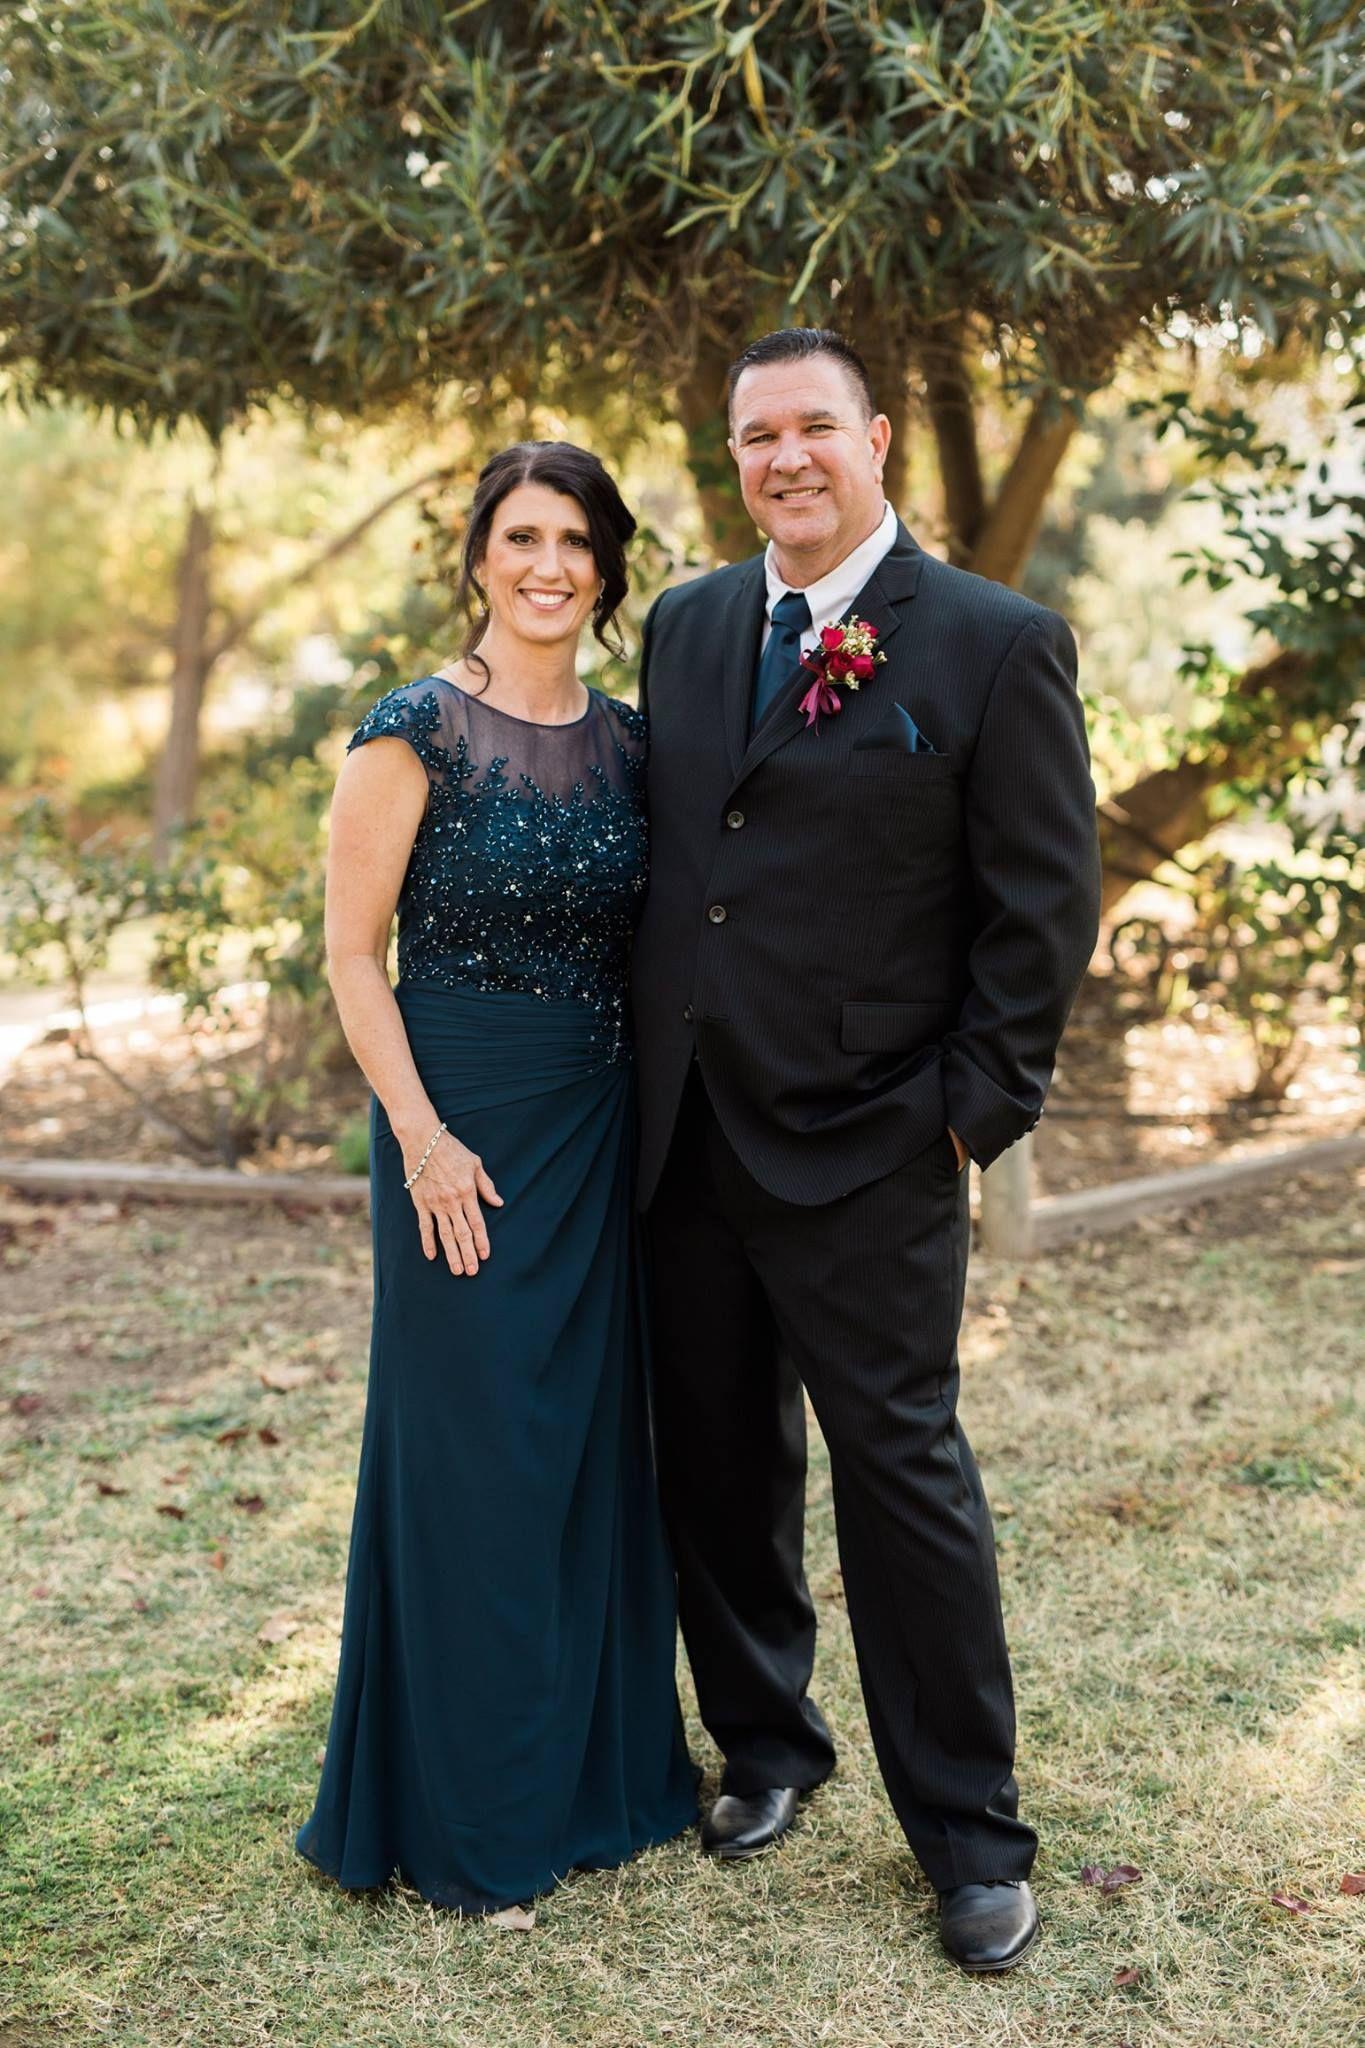 d966ad9d364fc Libby MBD in 2019 | Wedding | Bridesmaid dresses, Dresses, Mothers ...